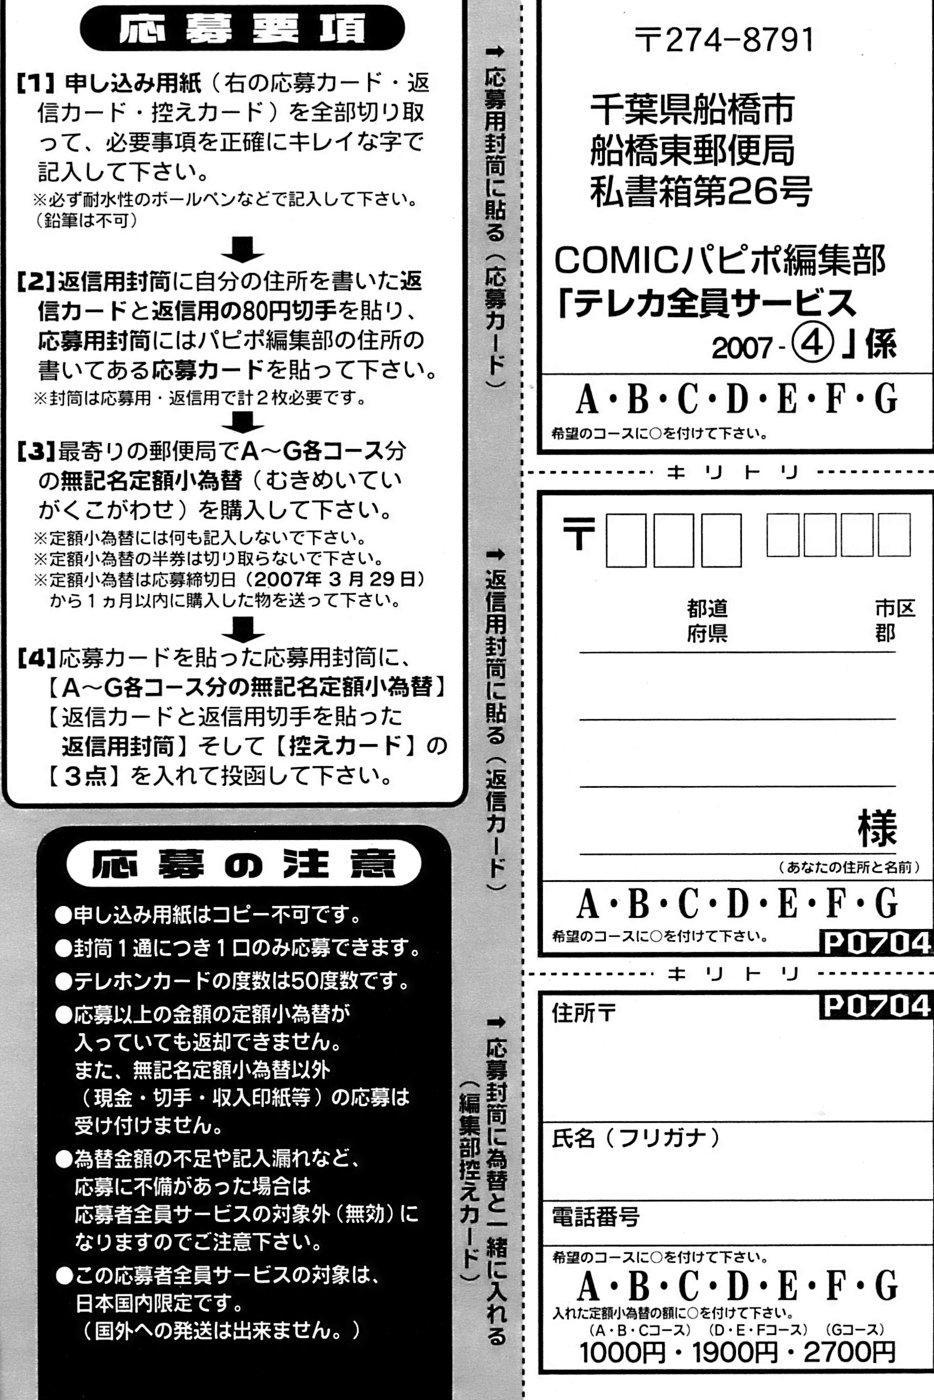 Comic Papipo 2007-04 259